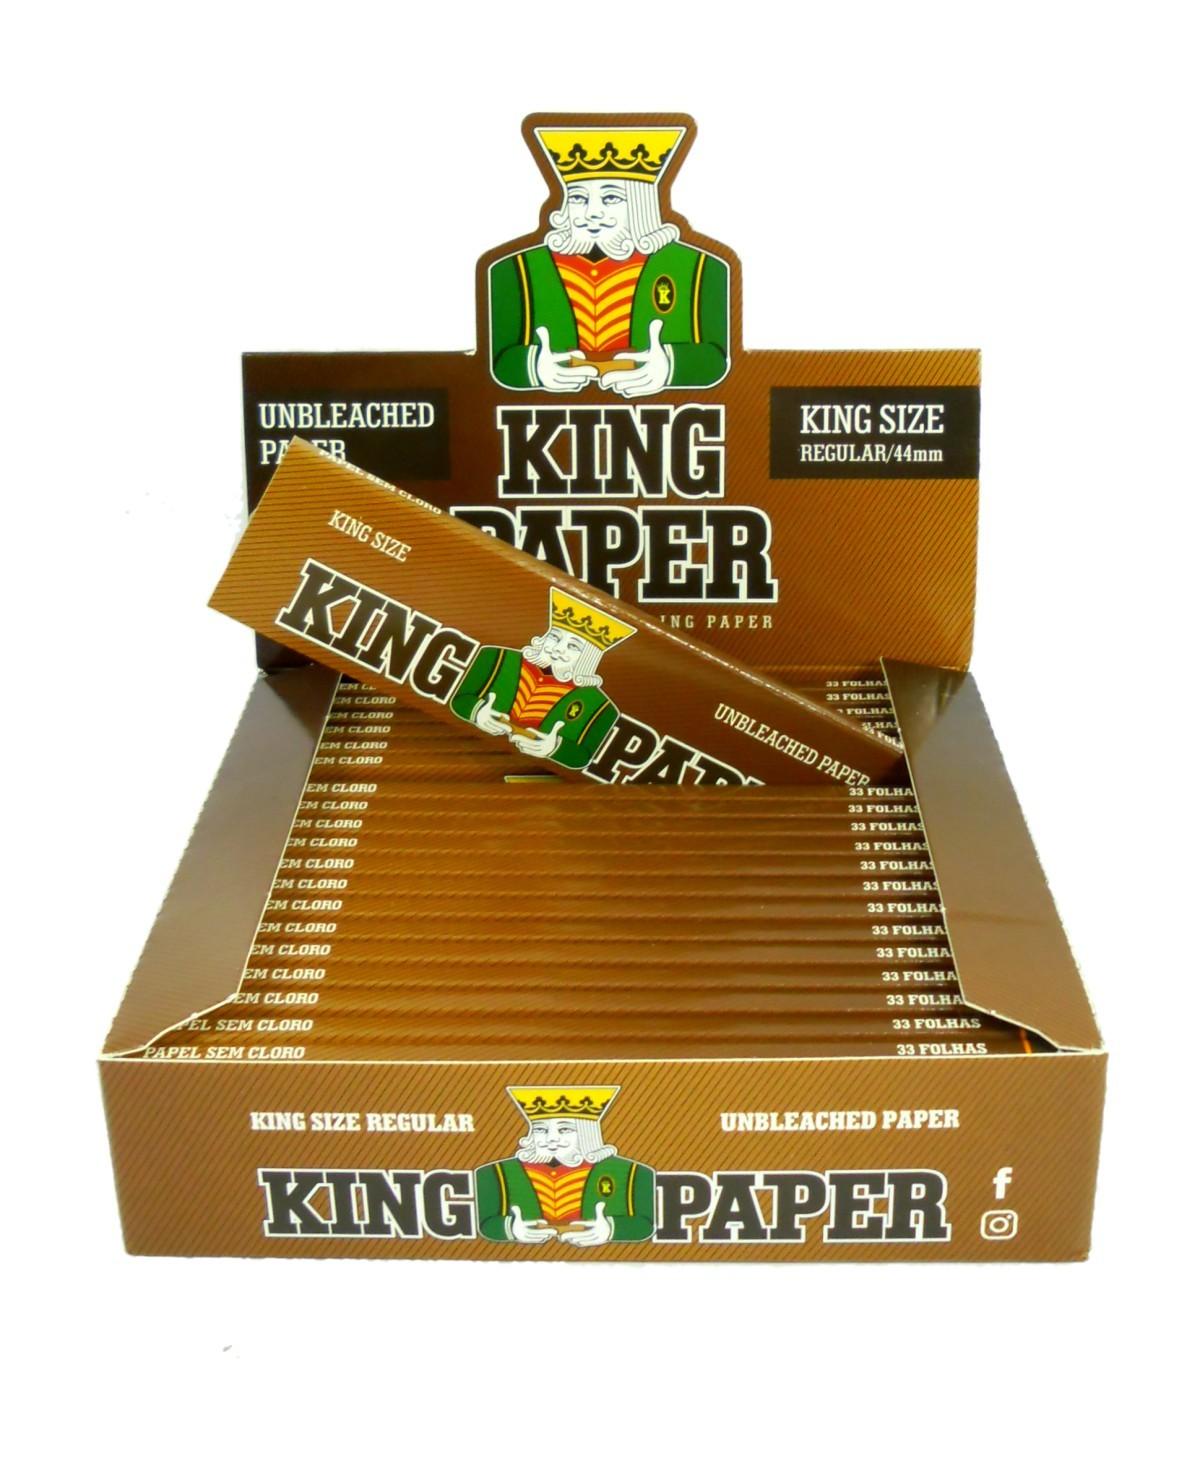 Seda King Paper Unbleached (MARROM) KING SIZE. Tamanho Grande/Regular 110X44mm marca Aleda - LIVRO AVULSO 33 folhas